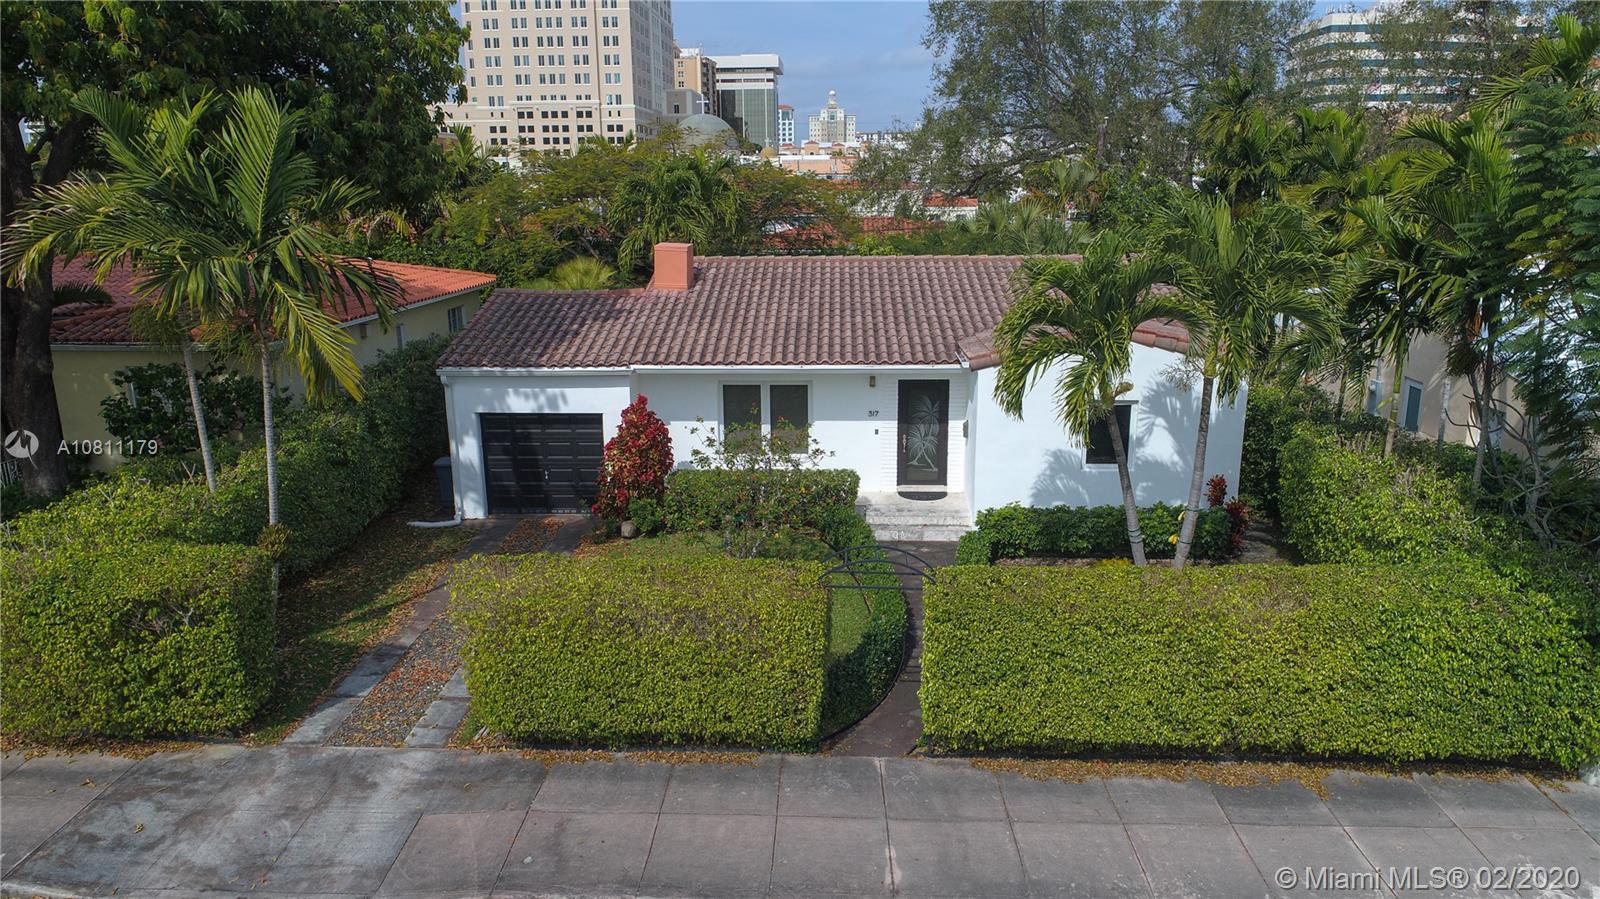 317 Malaga Ave, Coral Gables, Florida 33134, 2 Bedrooms Bedrooms, ,2 BathroomsBathrooms,Residential,For Sale,317 Malaga Ave,A10811179